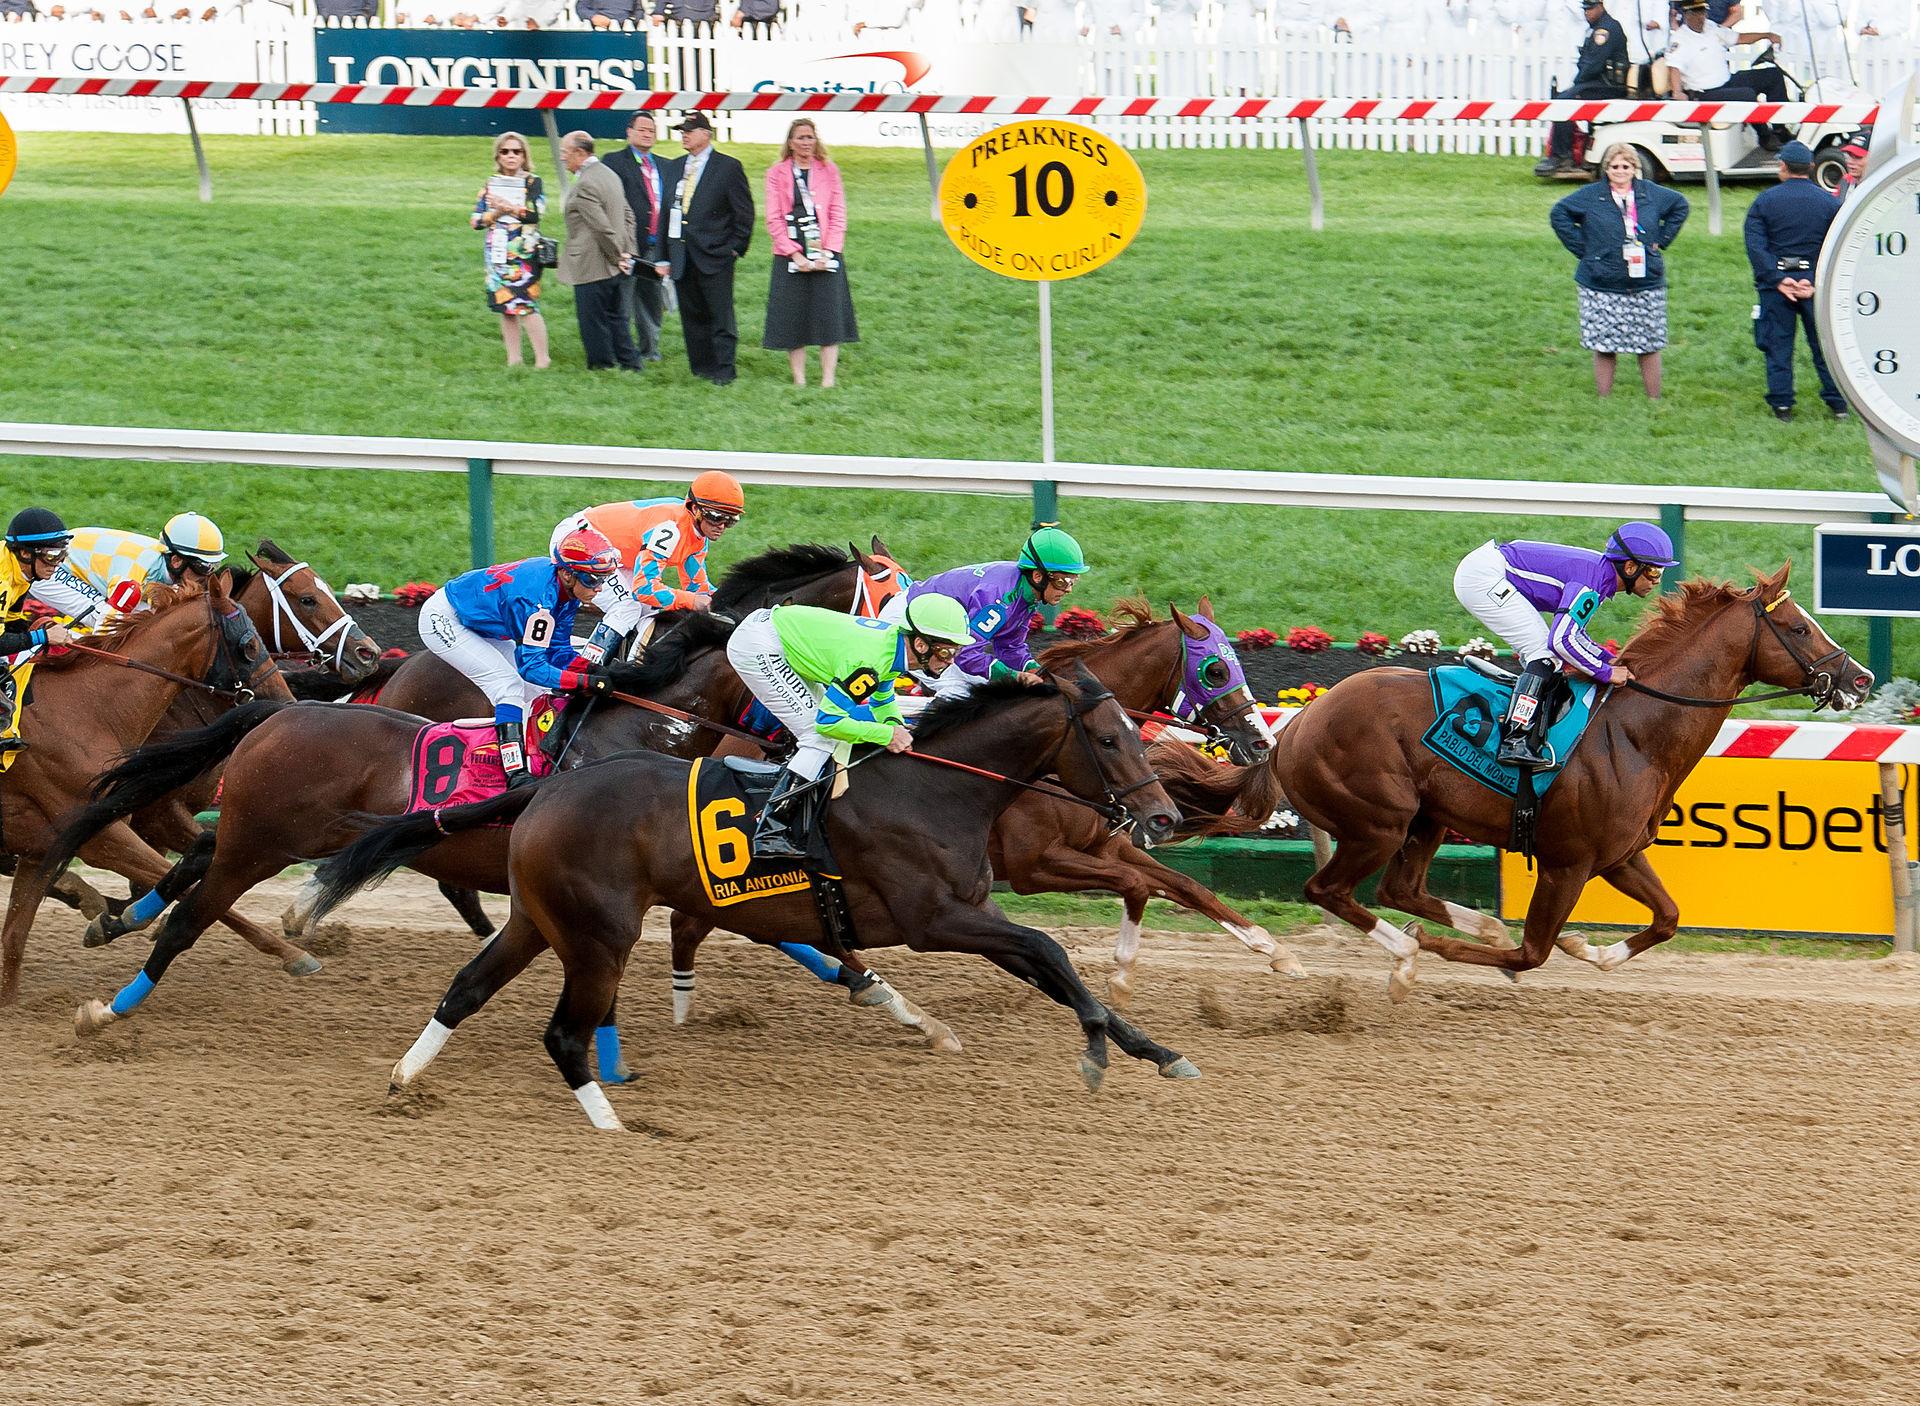 Thoroughbred horse racing - Wikipedia